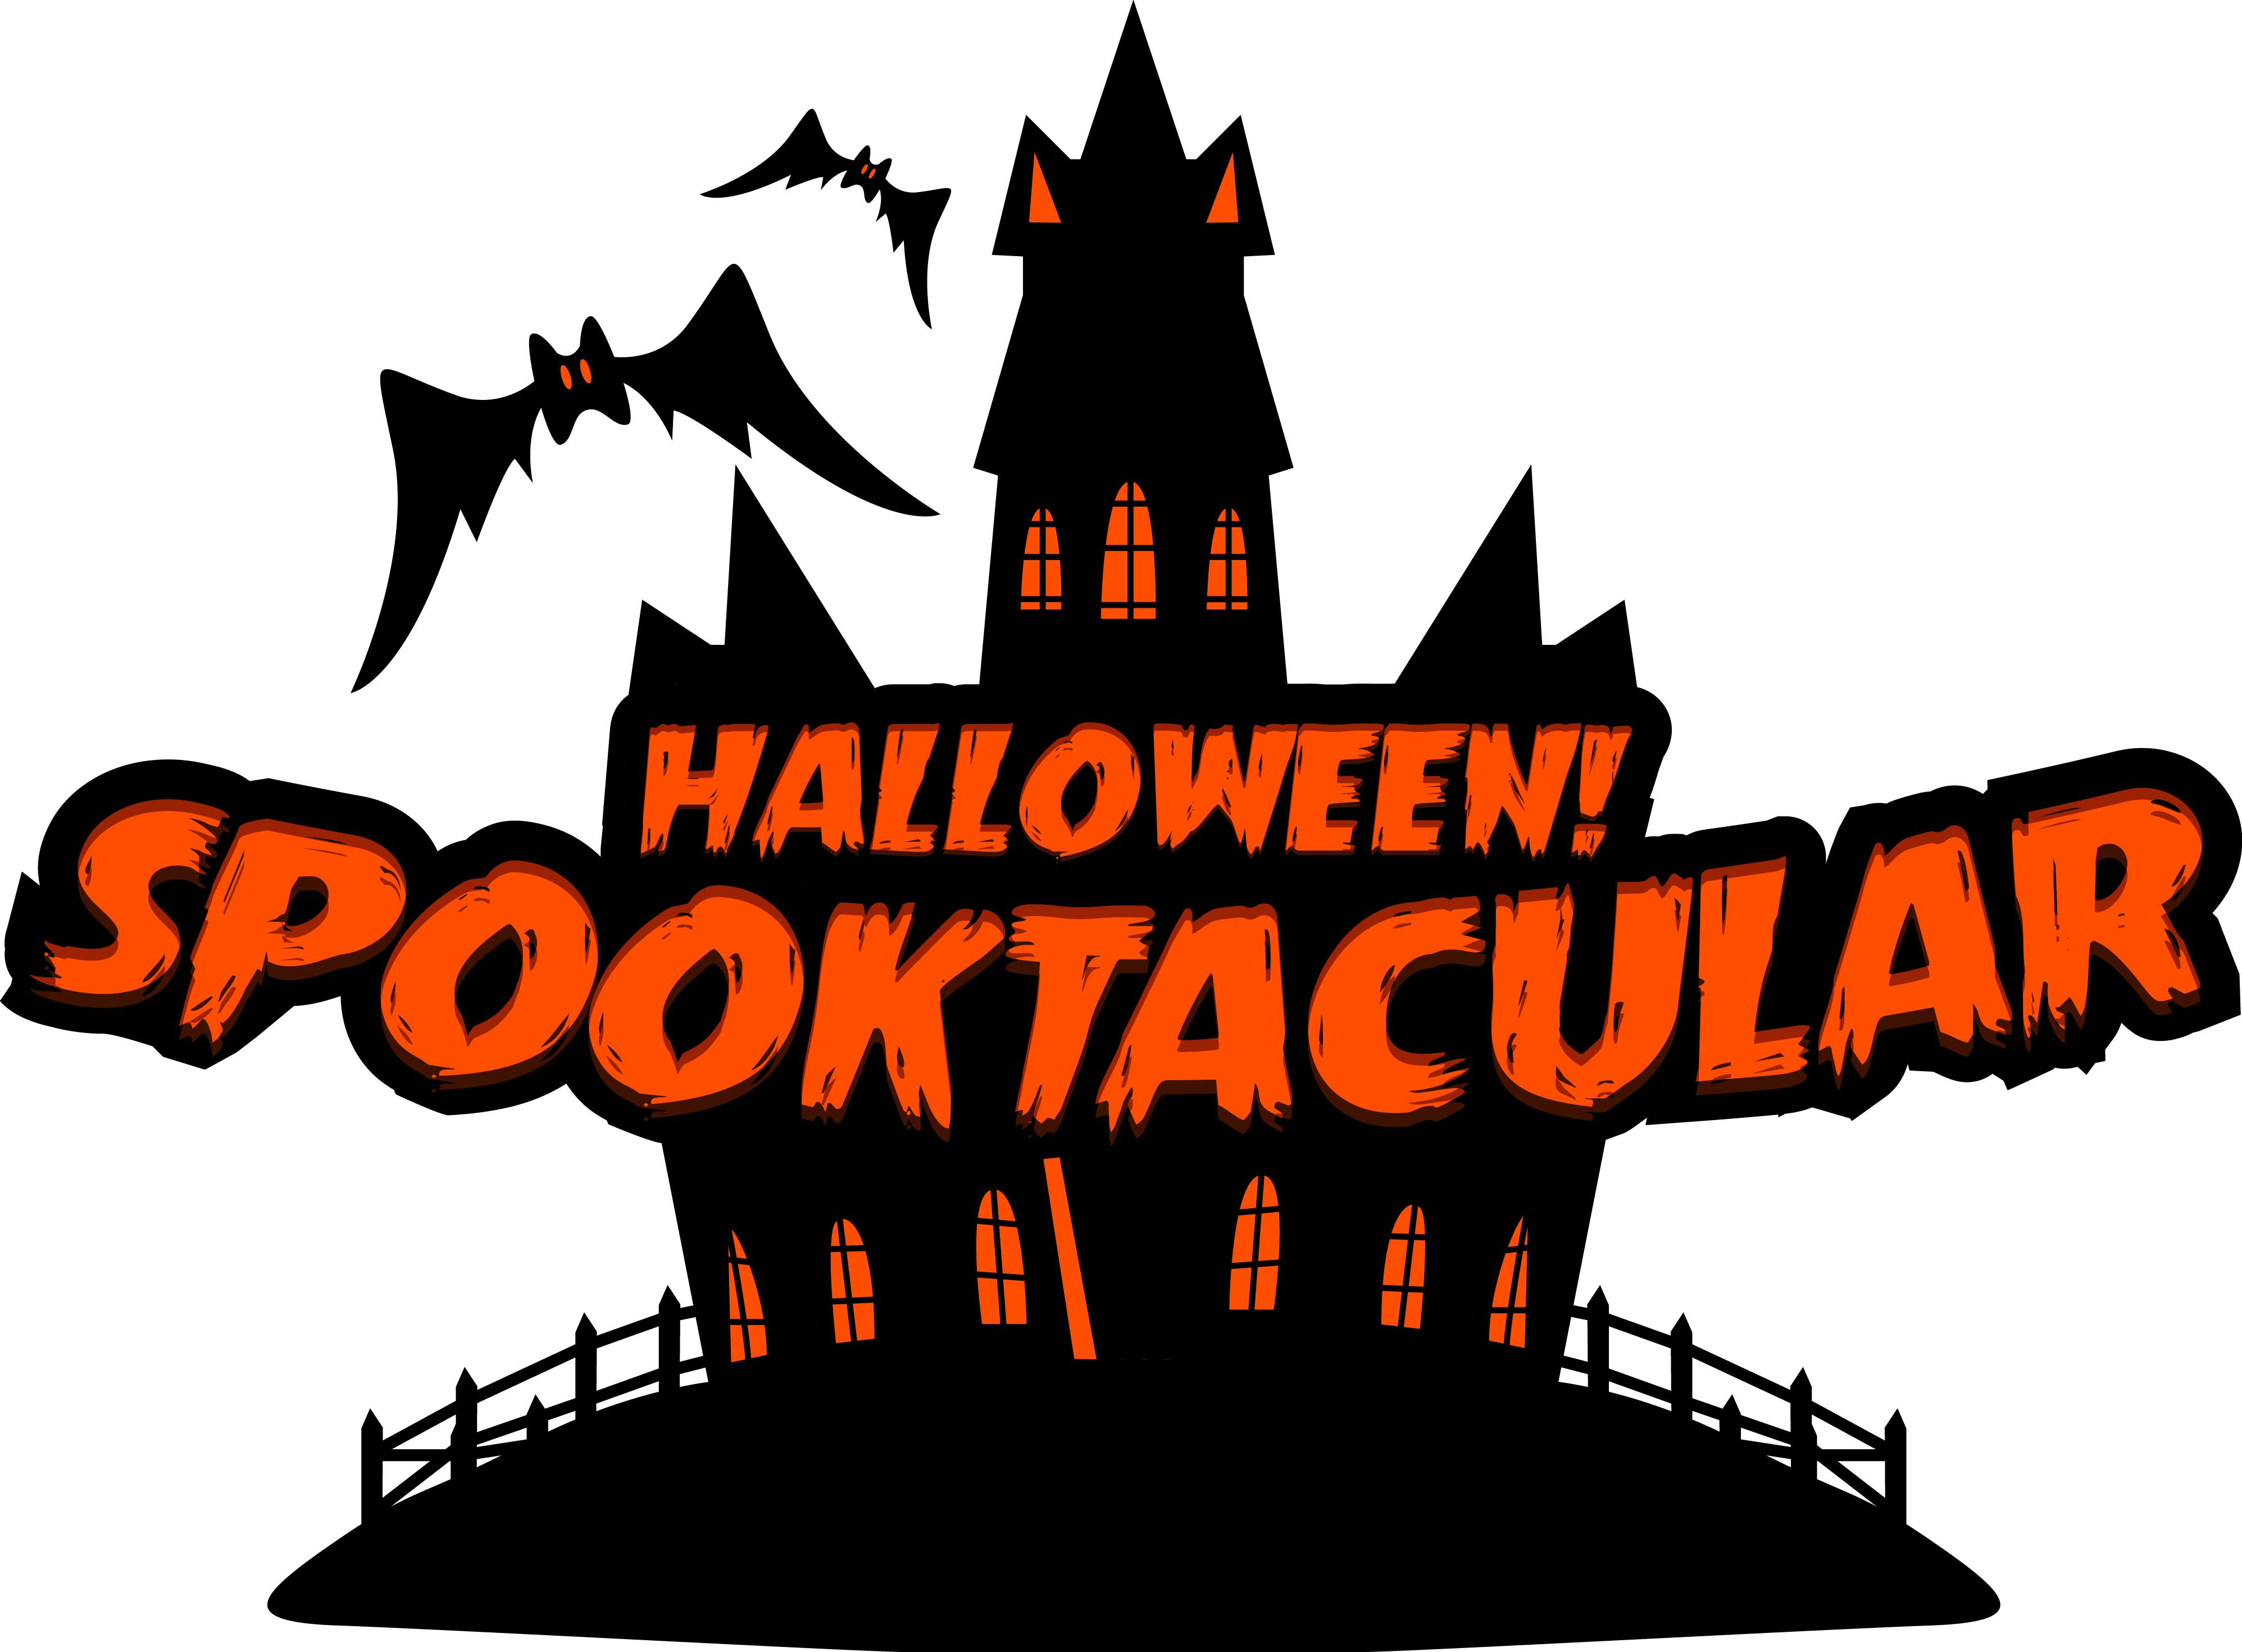 Halloween - Spooktacular - The T-Shirt Shop